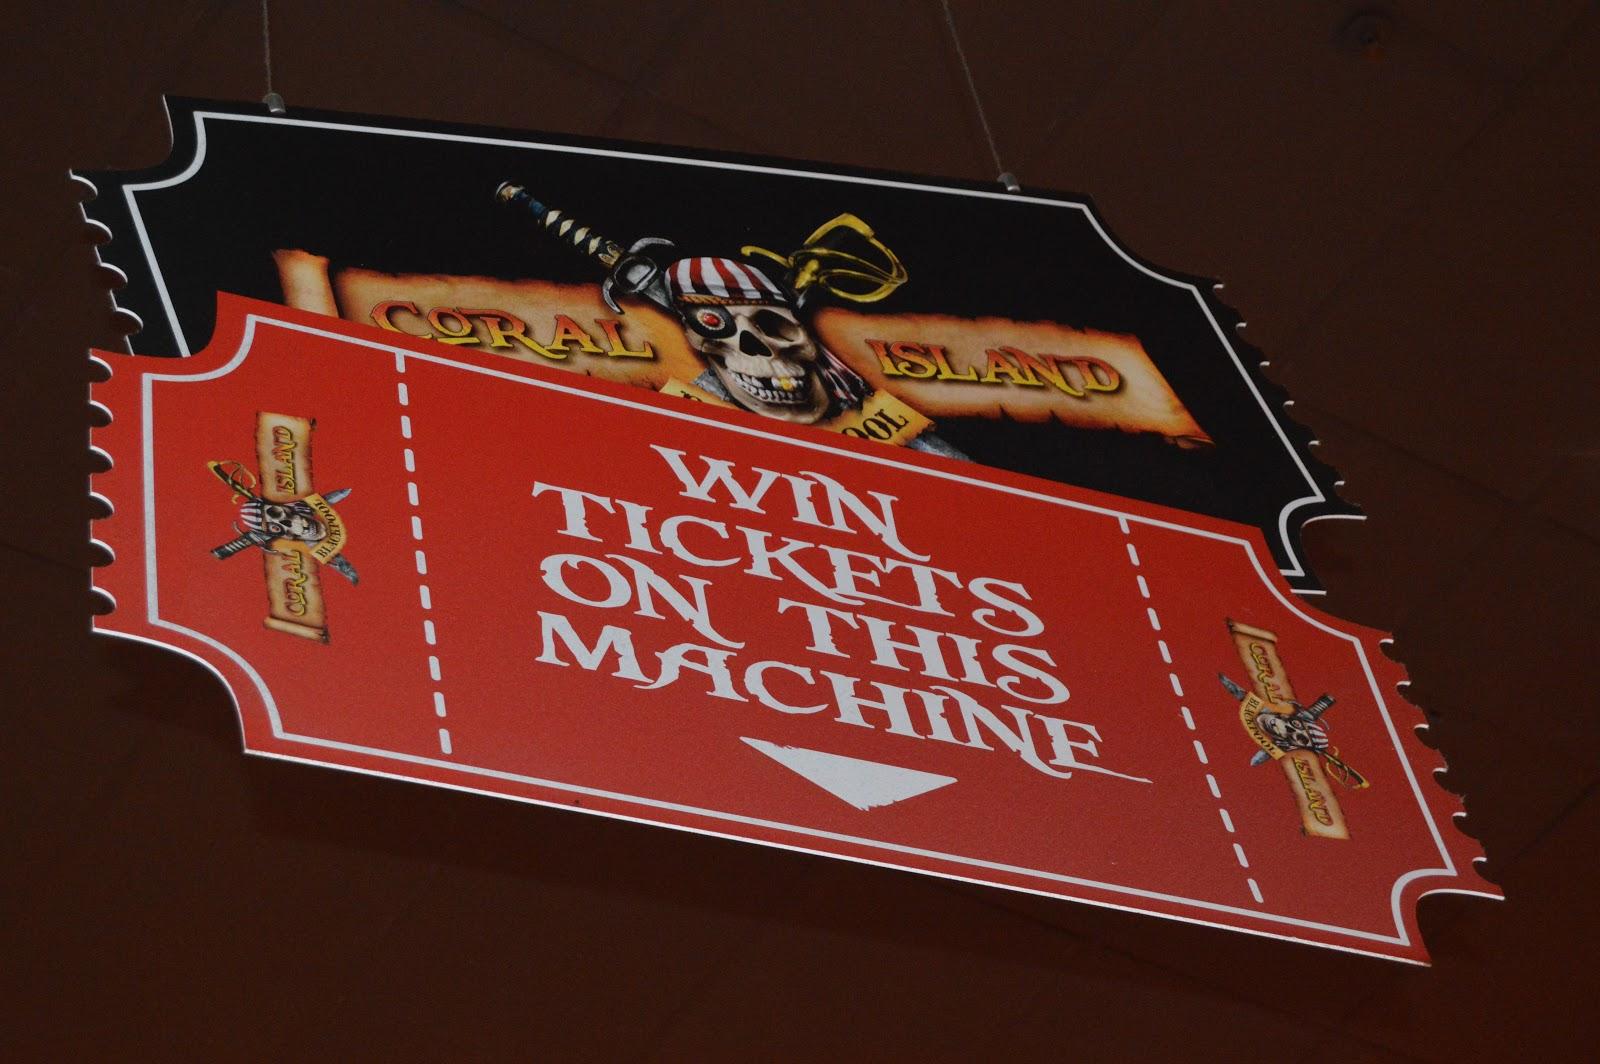 ticket machines at the Arcade